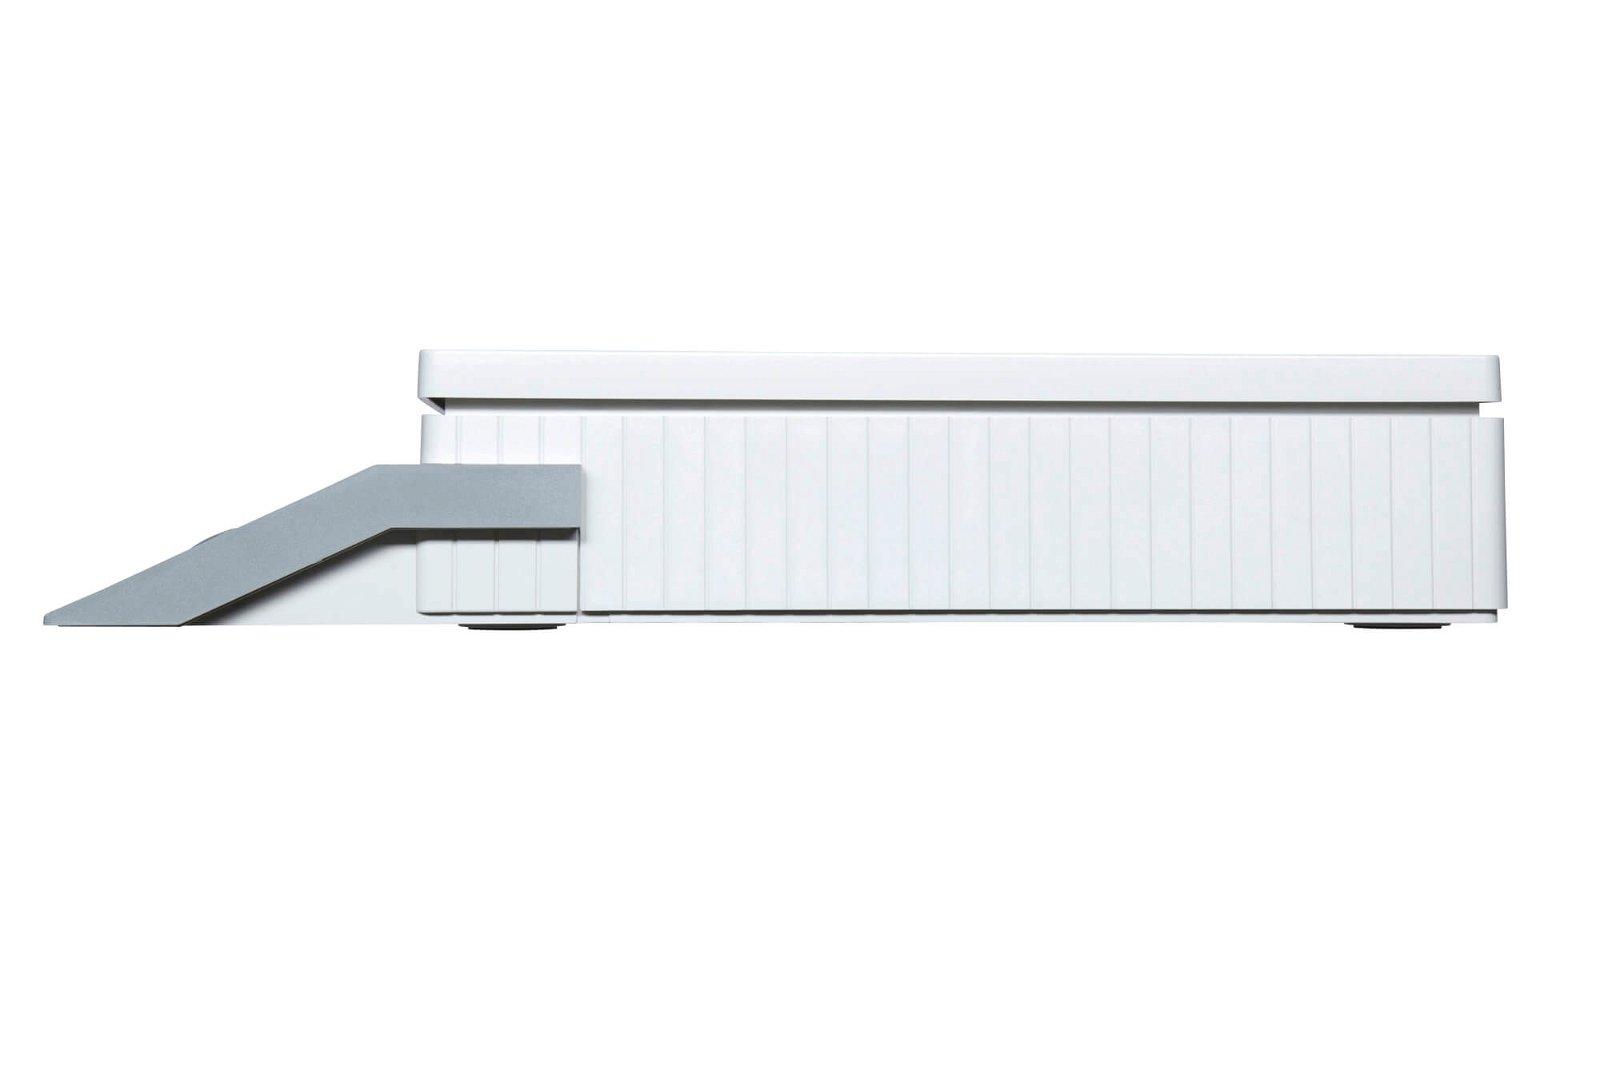 Solar-Paketwaage MAULparcel S, 50 kg, grau